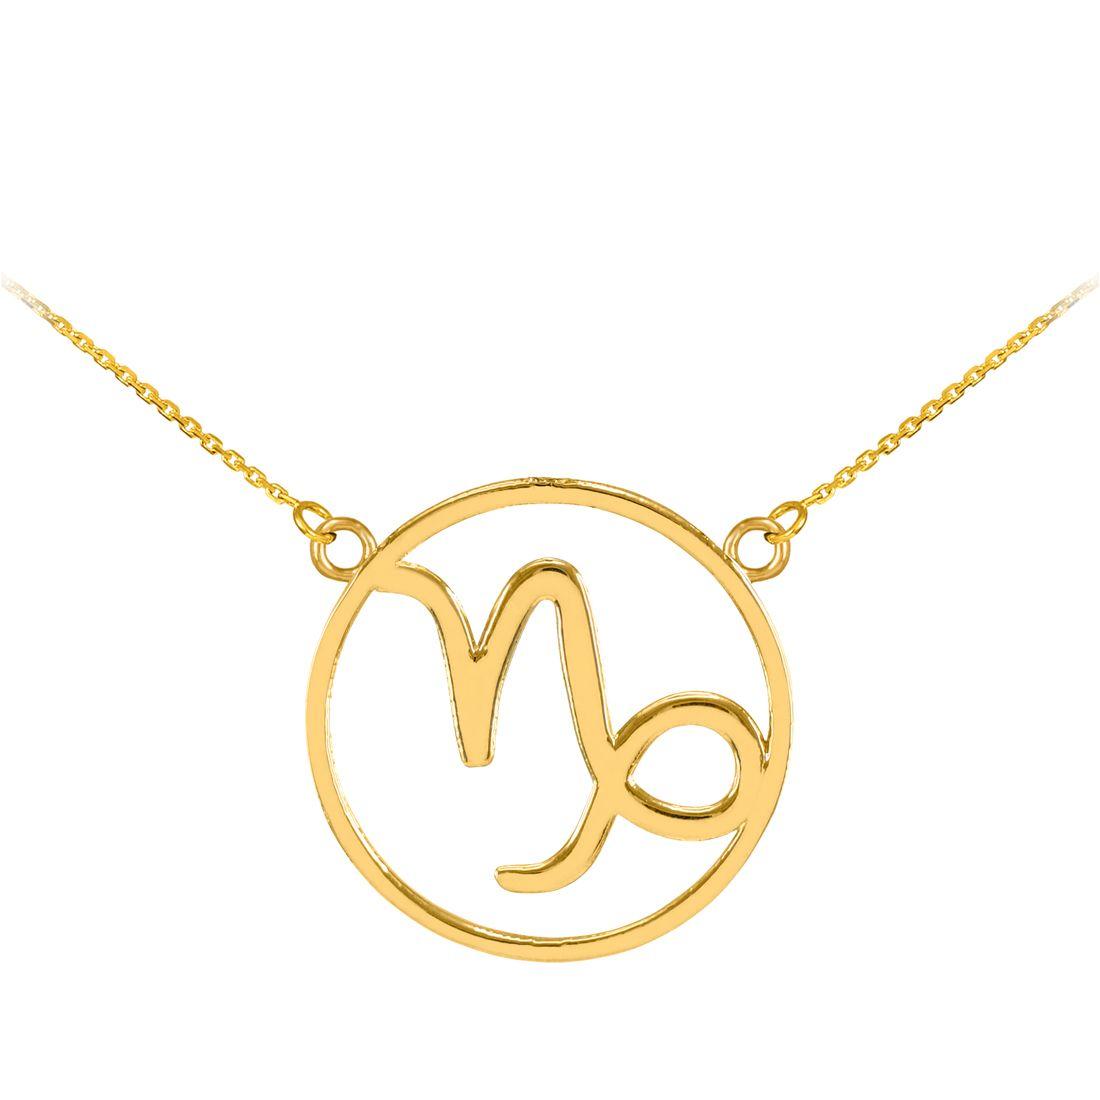 LABLINGZ 14K Polished White Gold Cancer Zodiac Sign Round Pendant